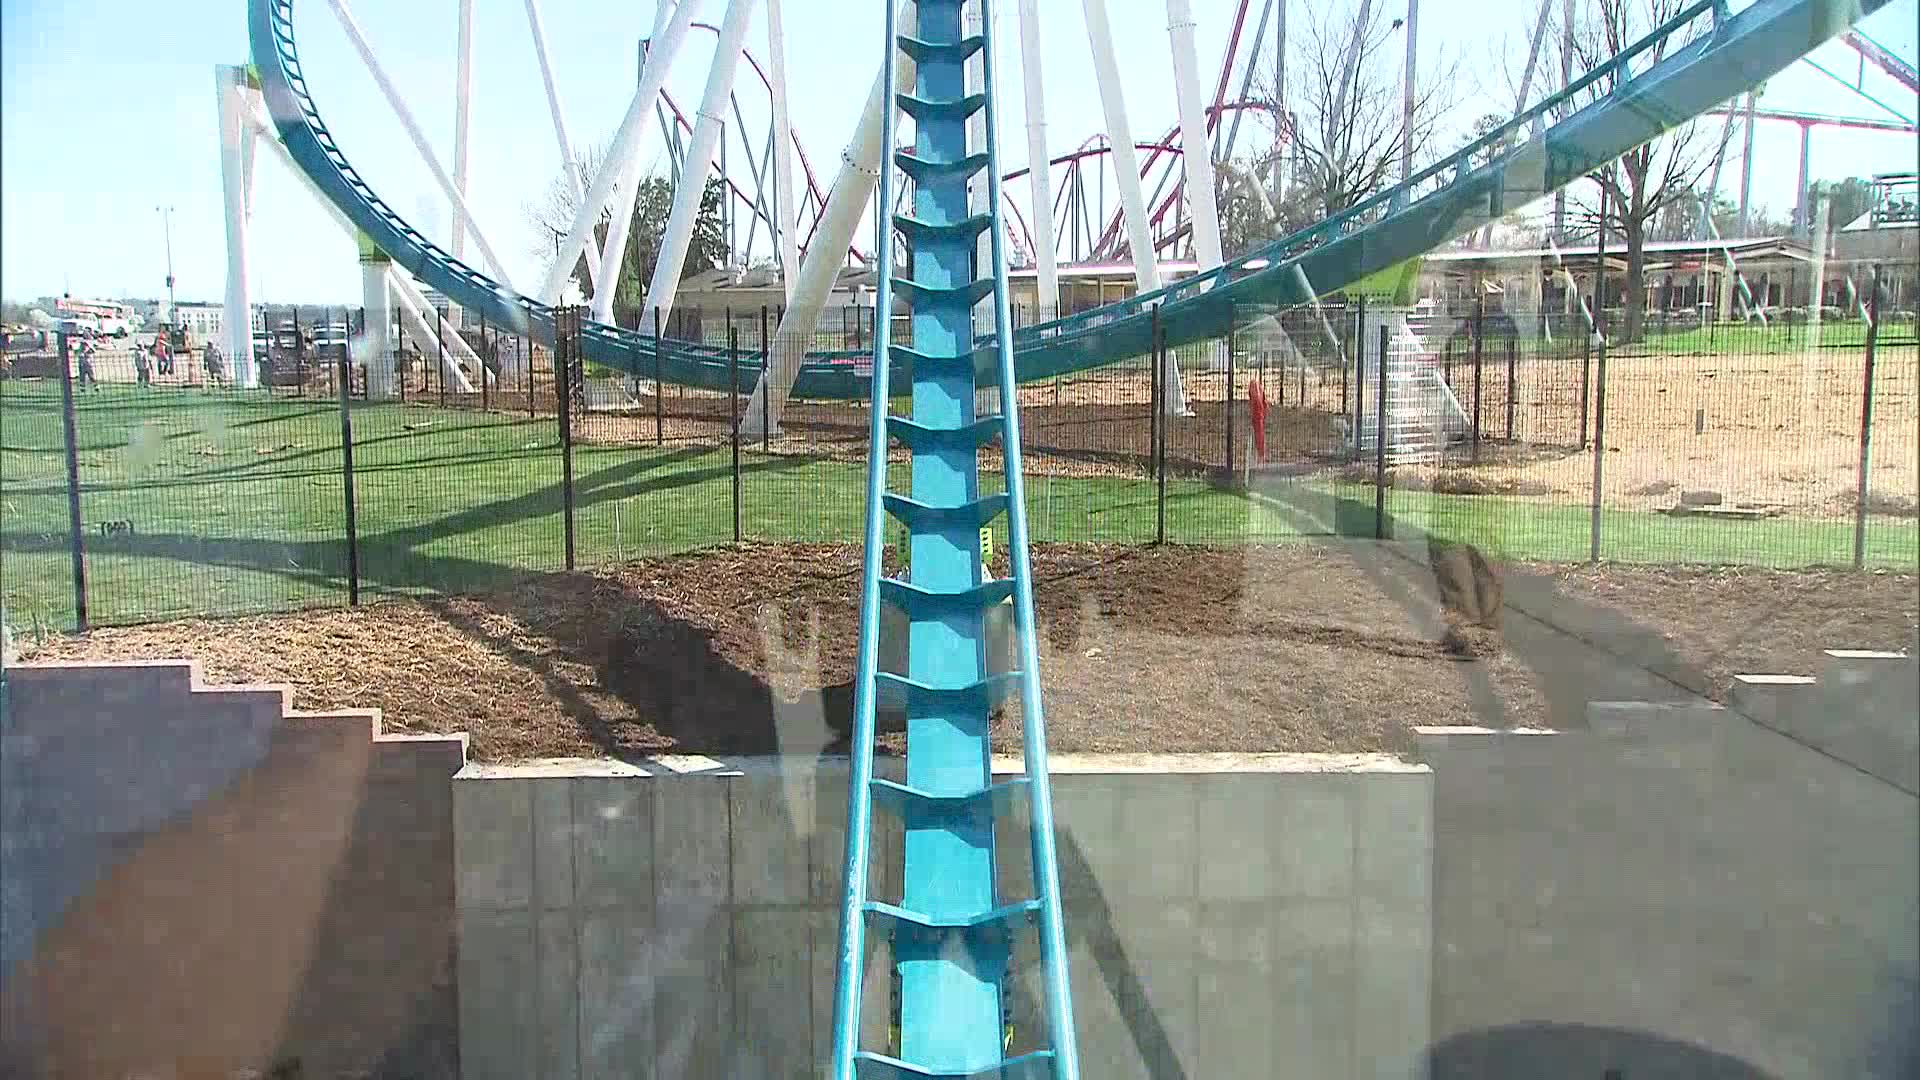 coaster_217021